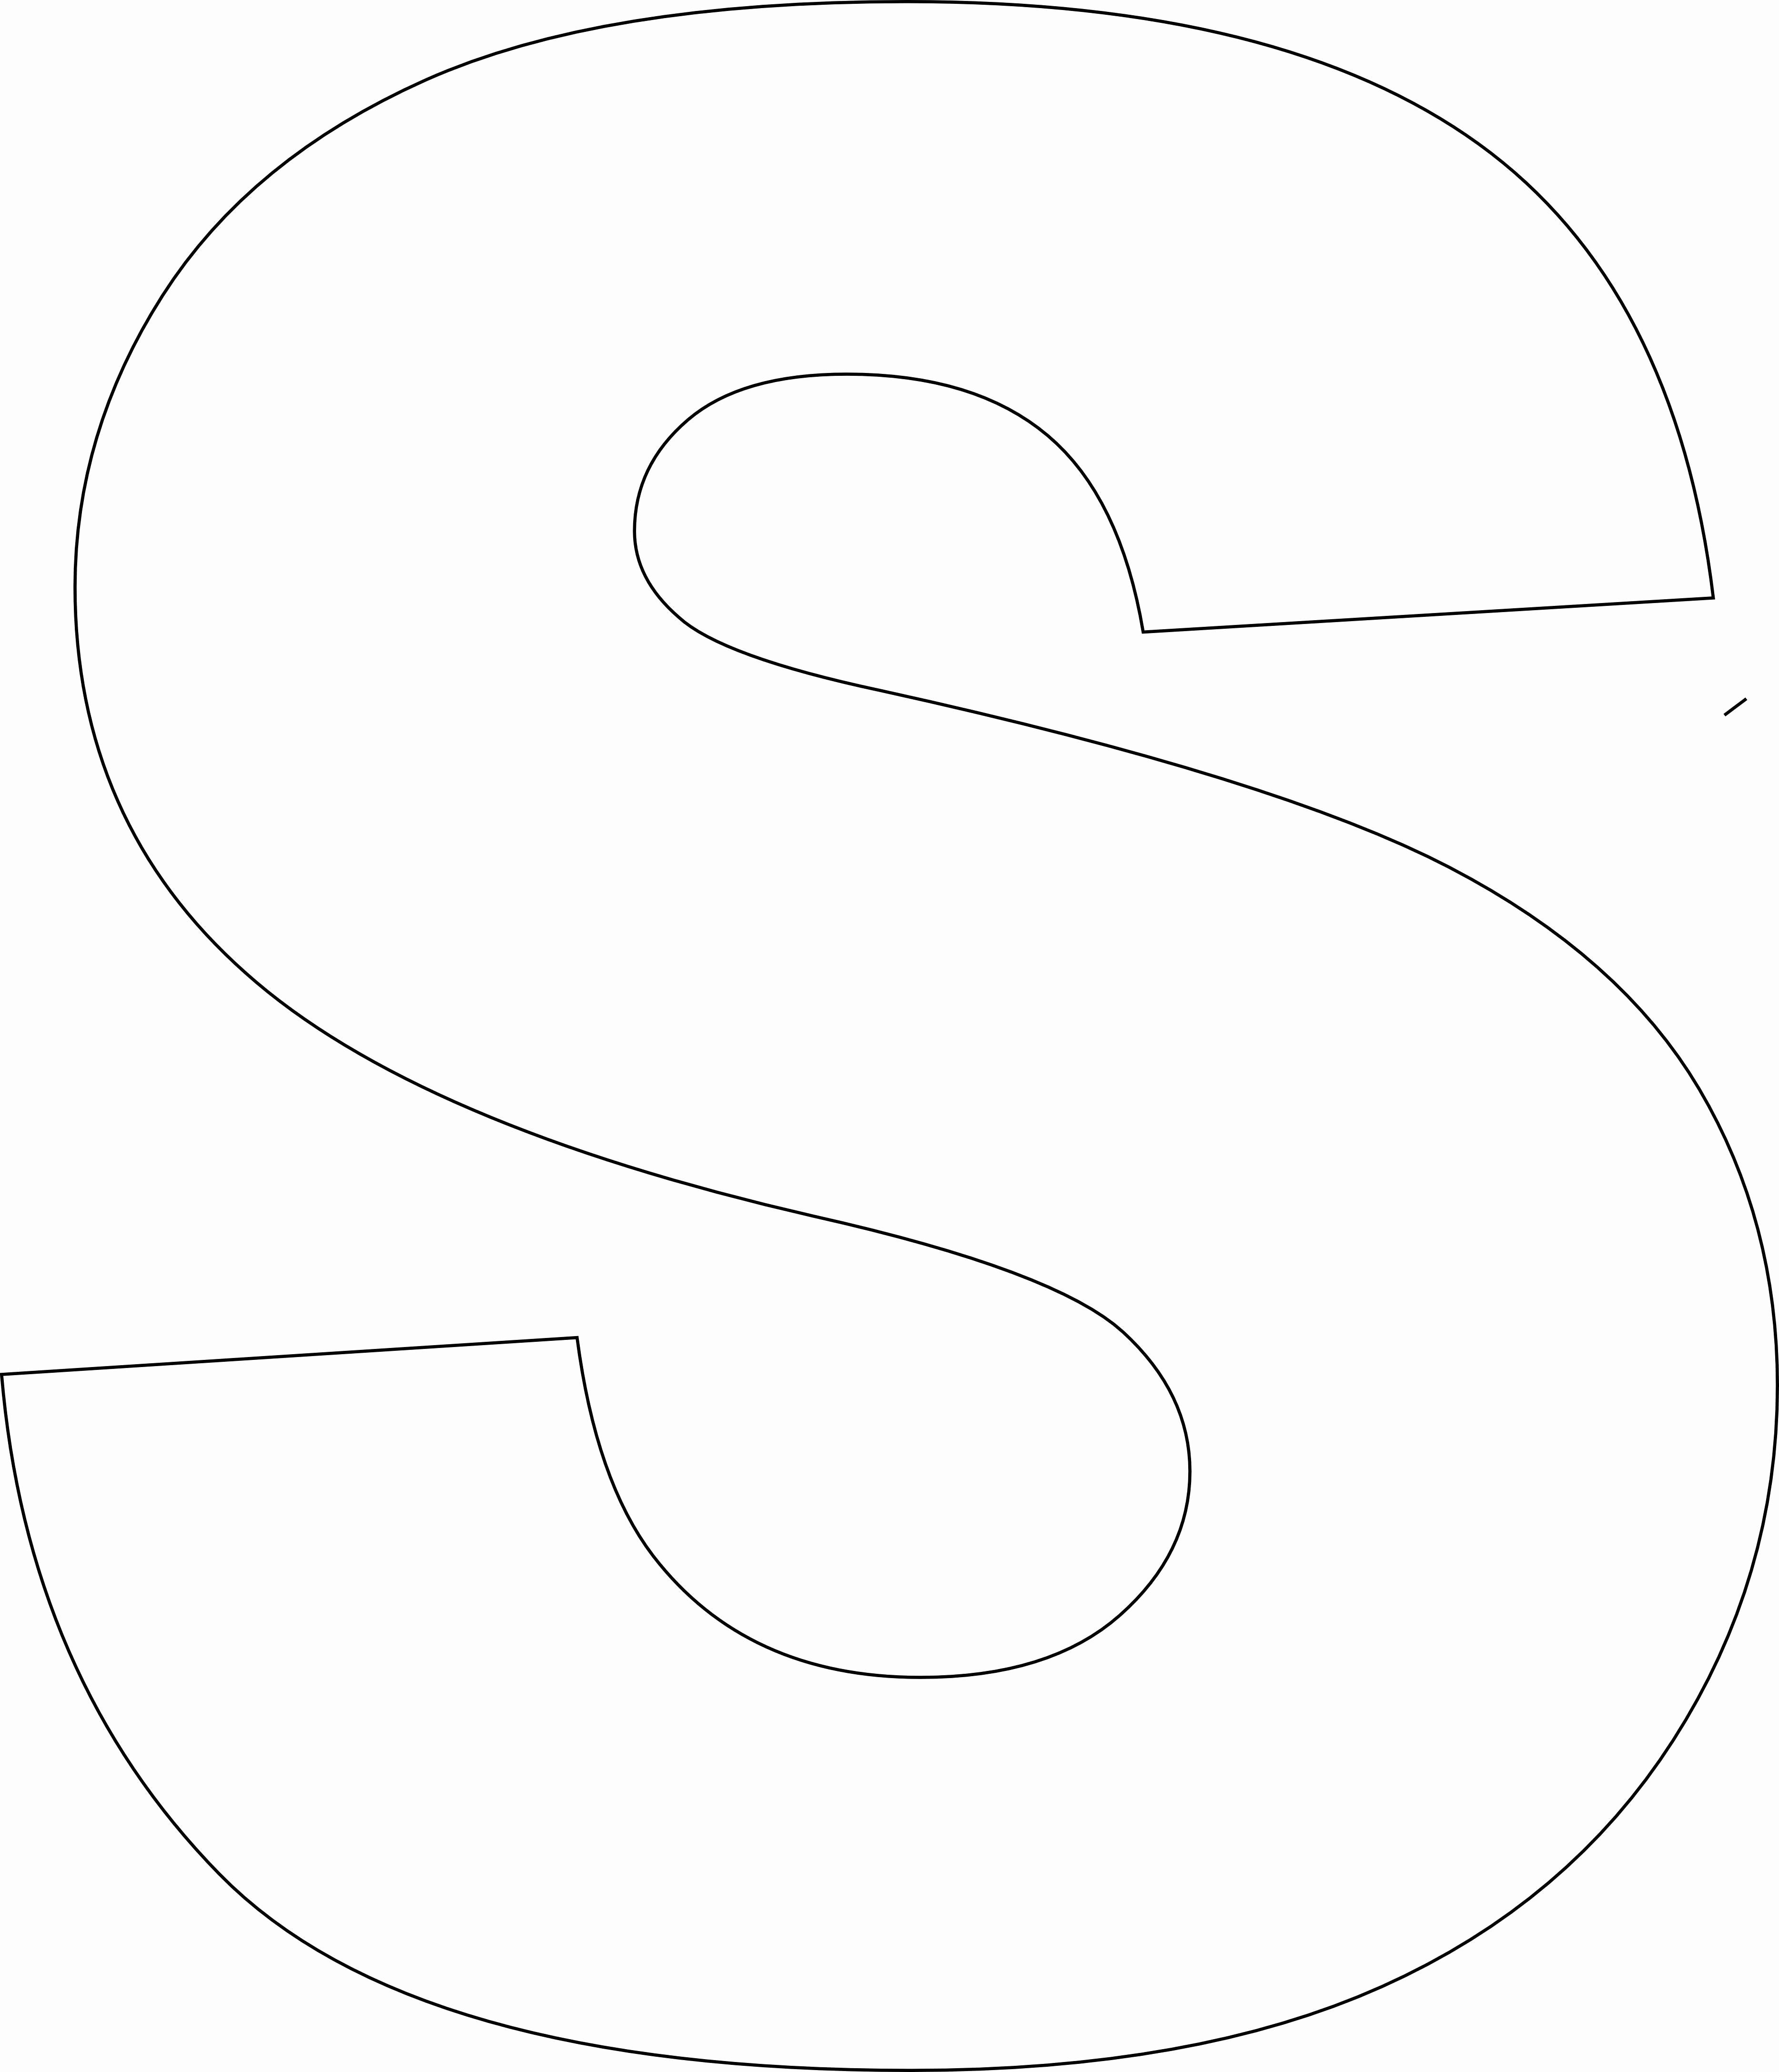 Free Printable Alphabet Stencils Templates New Free Printable Upper Case Alphabet Template